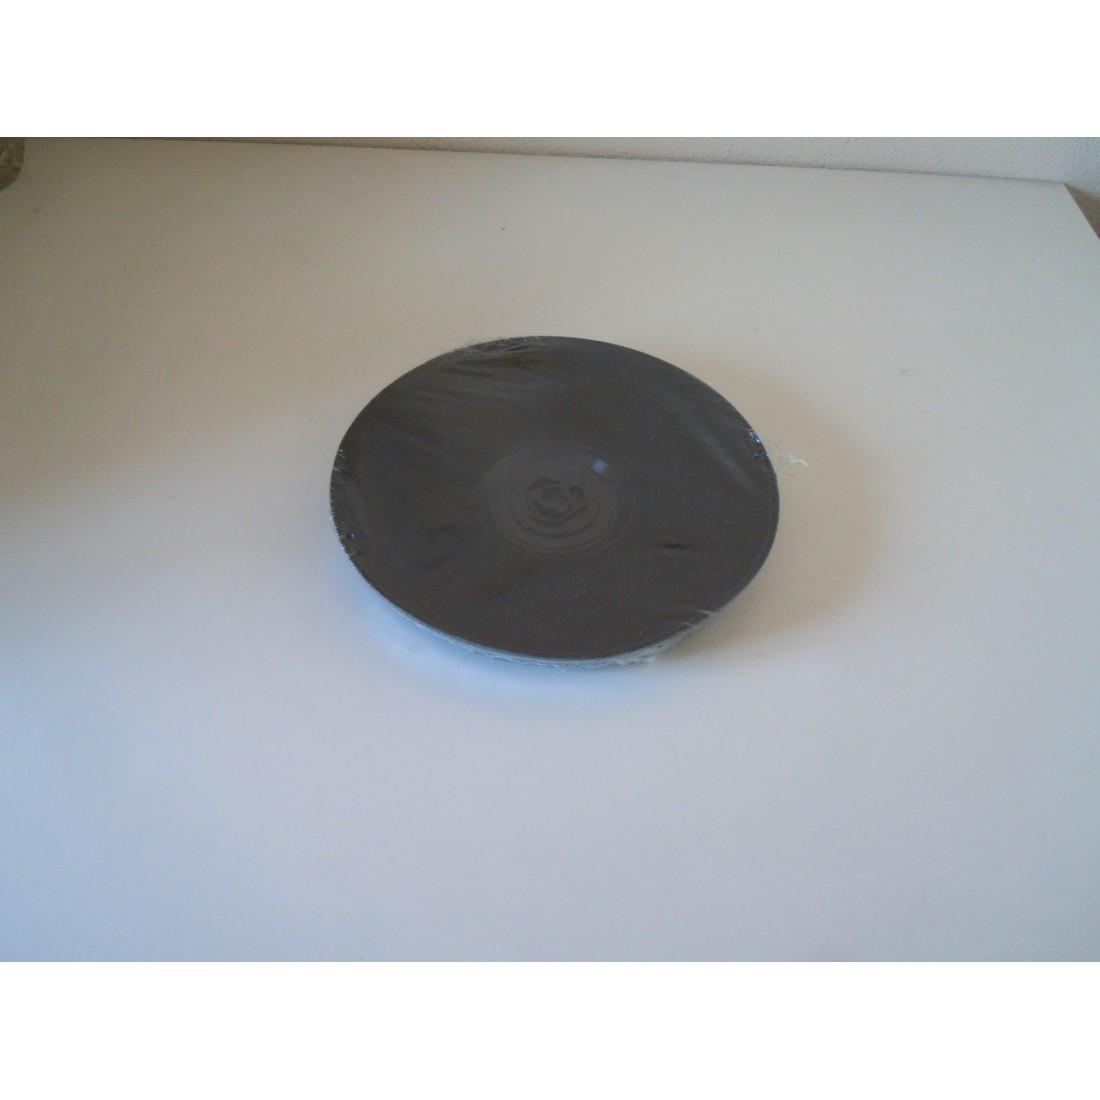 Filtro cappa in carbone cucina Faber E233 misure 233x20 mm